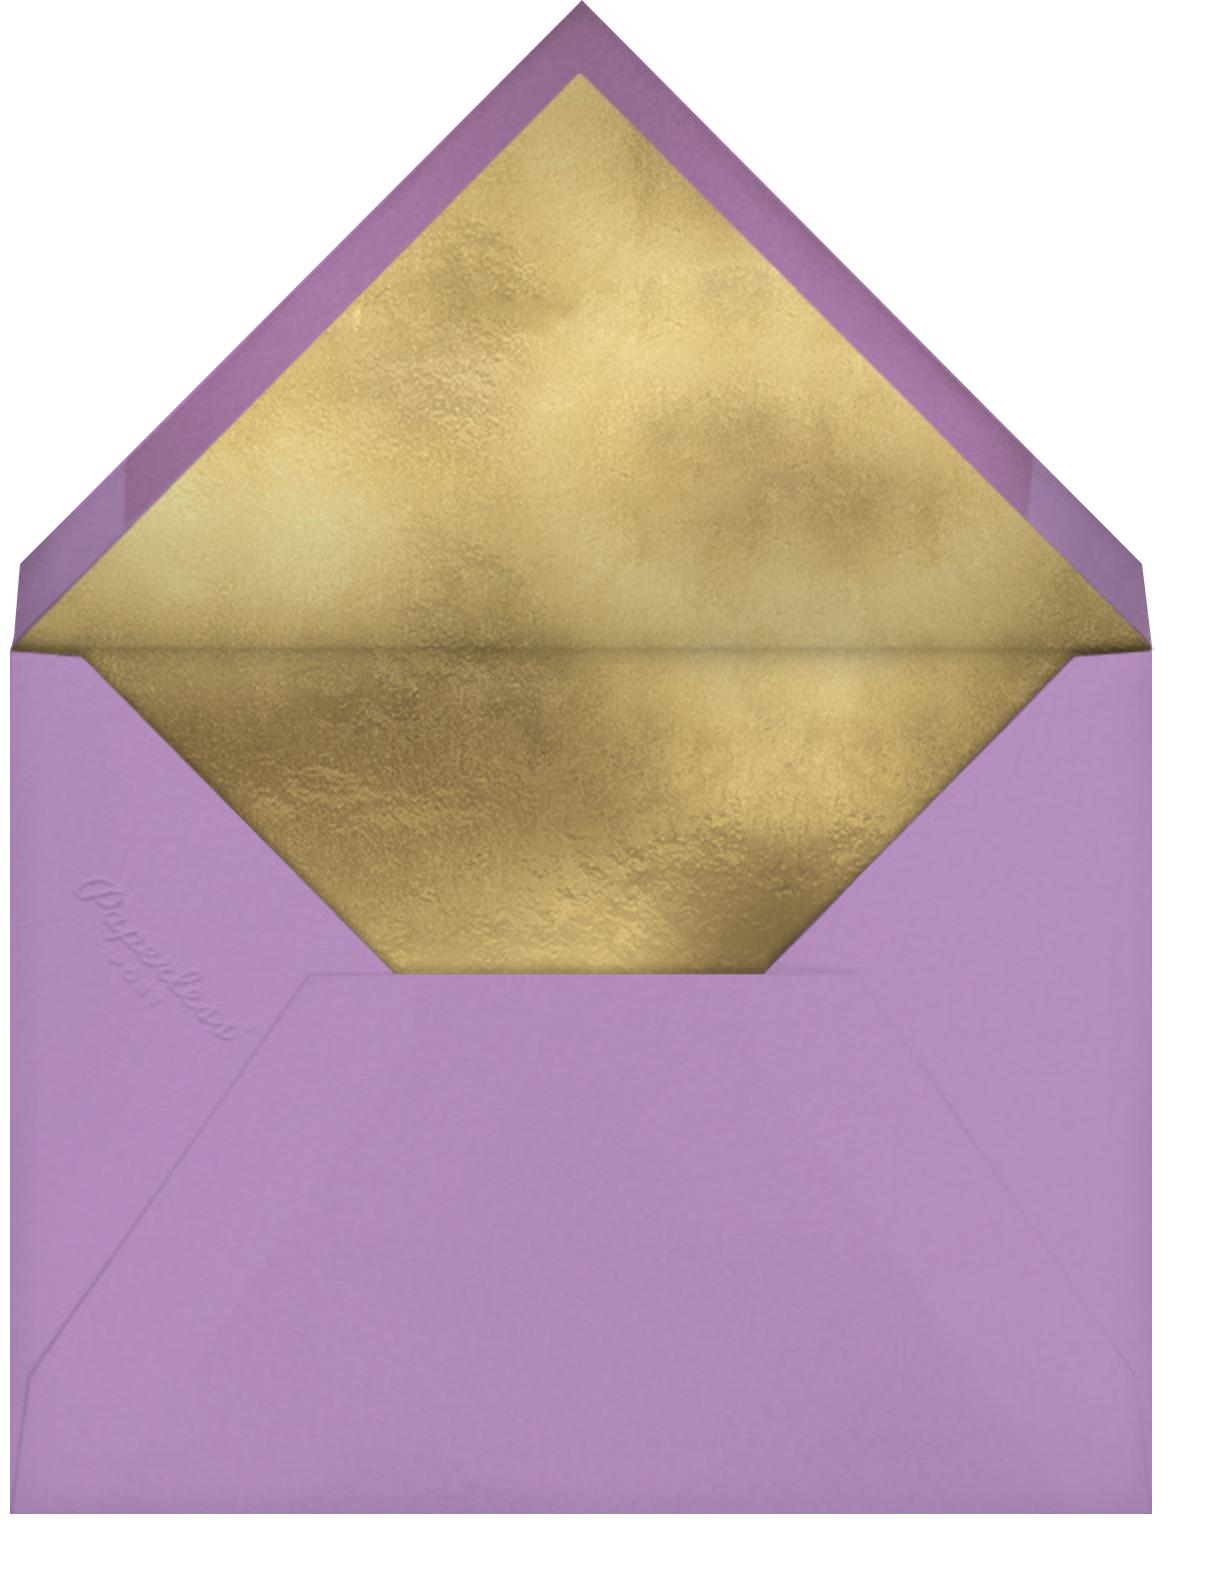 Hermoso Vestido - Lilac - Paperless Post - Envelope